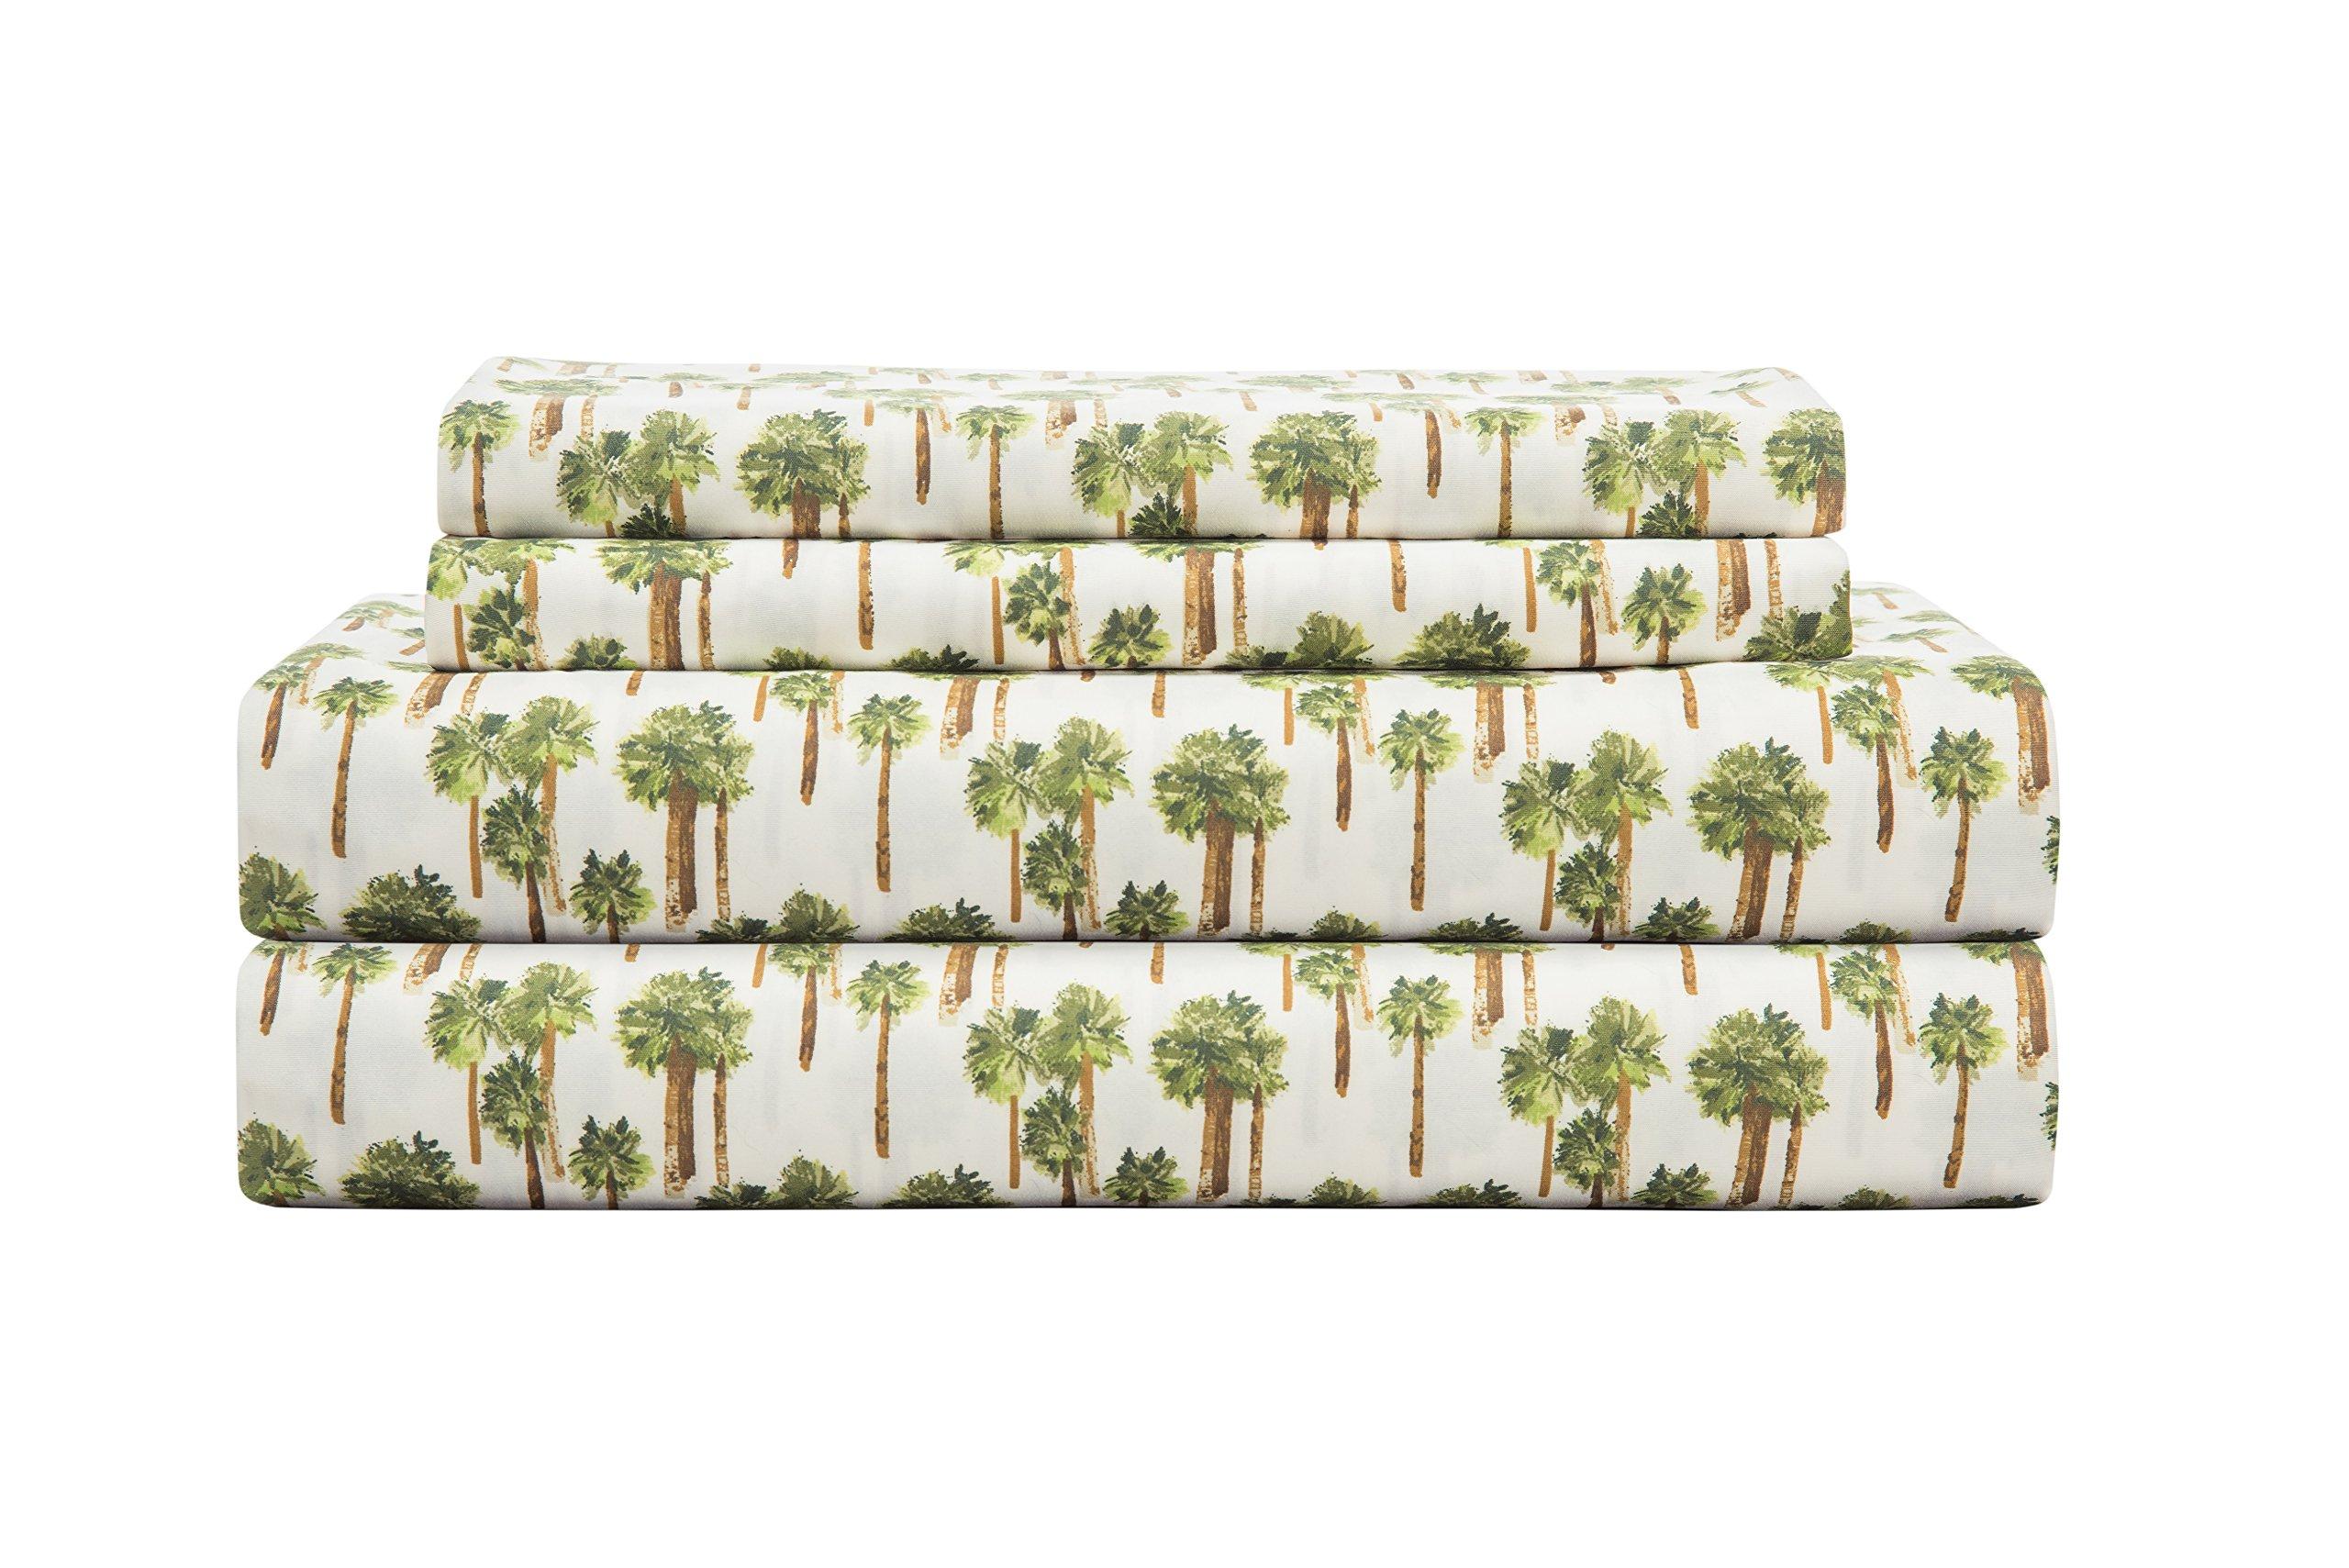 Elite Home Products 90 Gsm Microfiber Coastal Beach-Themed Printed Sheet Set, California King, Palm Tree Ivory